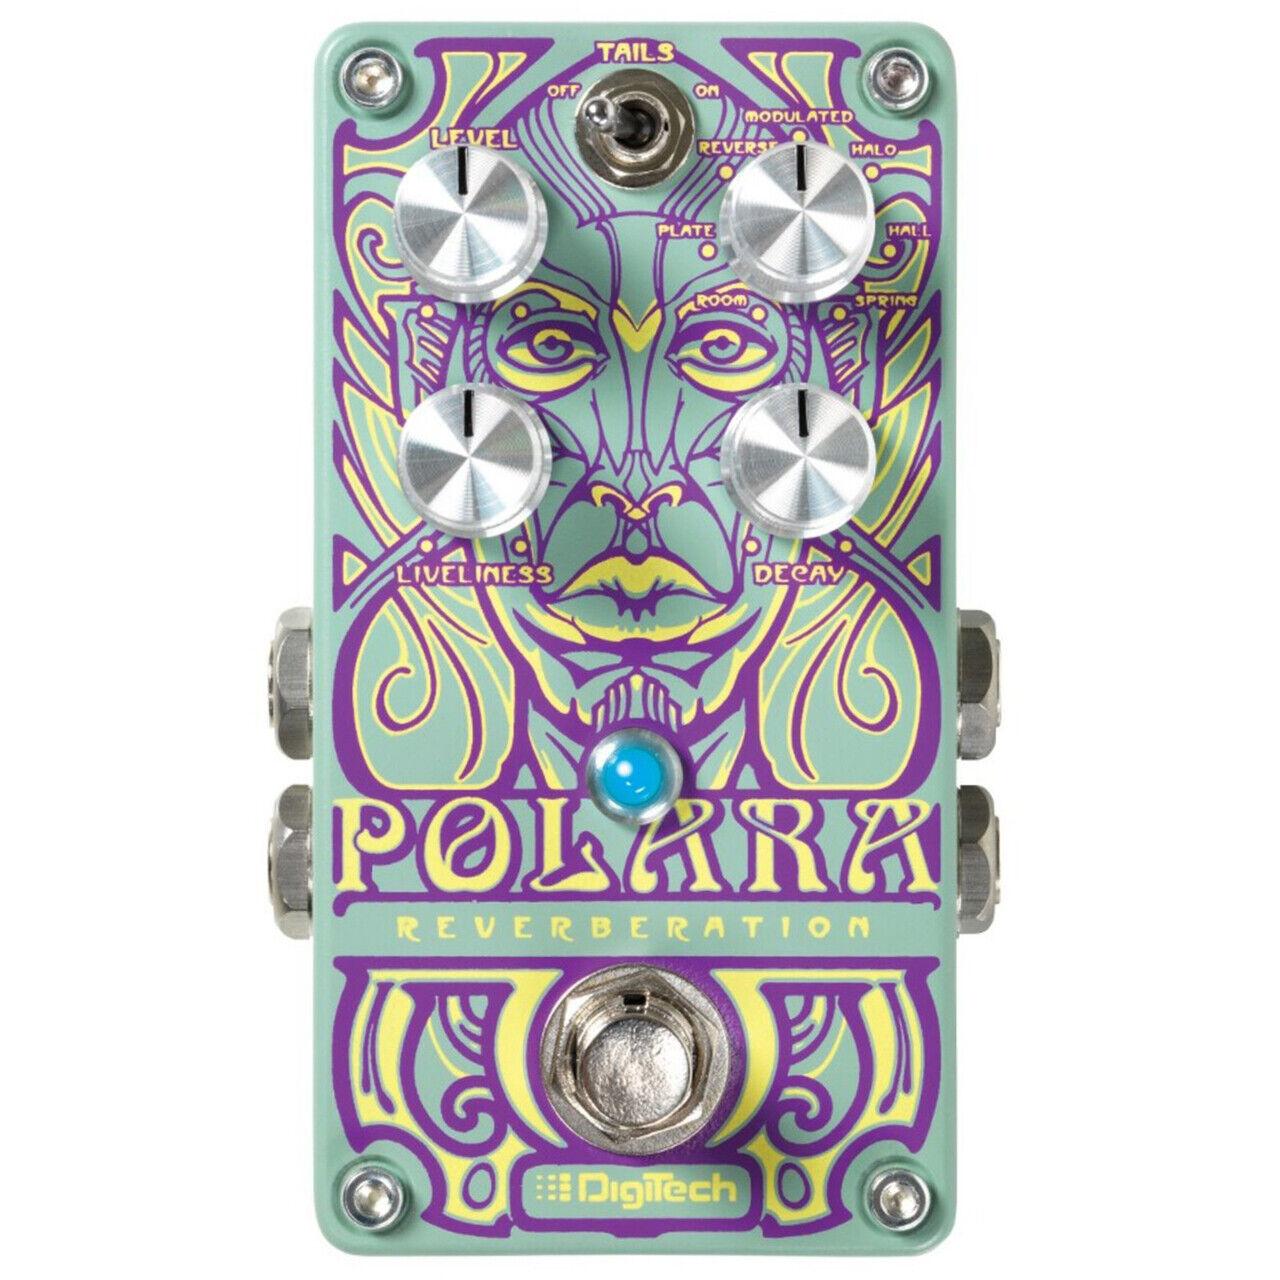 DigiTech Polara Lexicon Stereo Reverb Guitar Effects Pedal